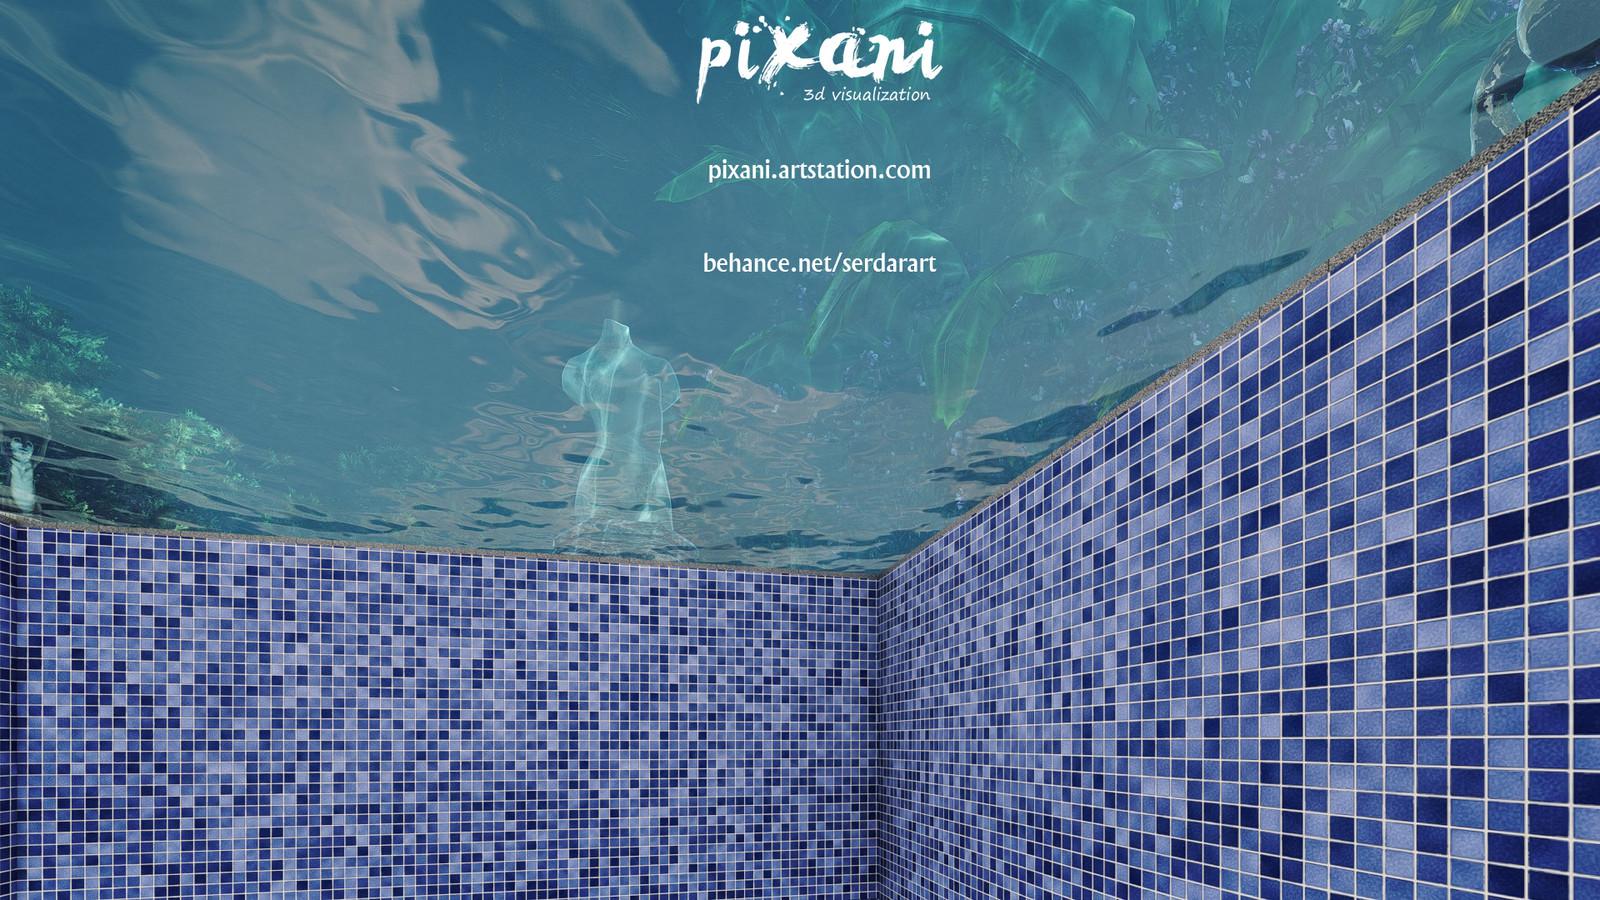 PIXANI 3D VISUALIZATION for much more, follow us. ARTSTATION https://pixani.artstation.com/ BEHANCE https://www.behance.net/serdarart